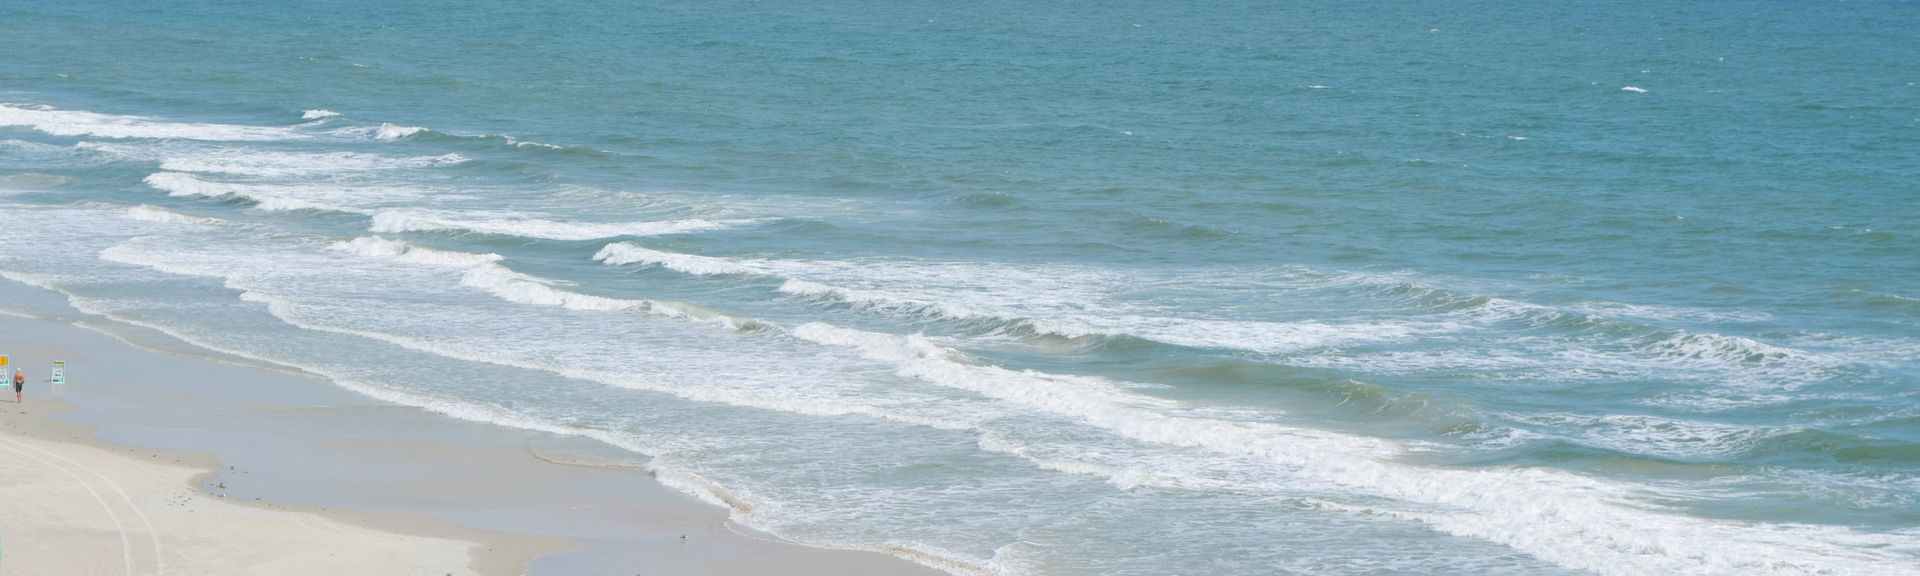 Ortona Park, Daytona Beach, Florida, Vereinigte Staaten